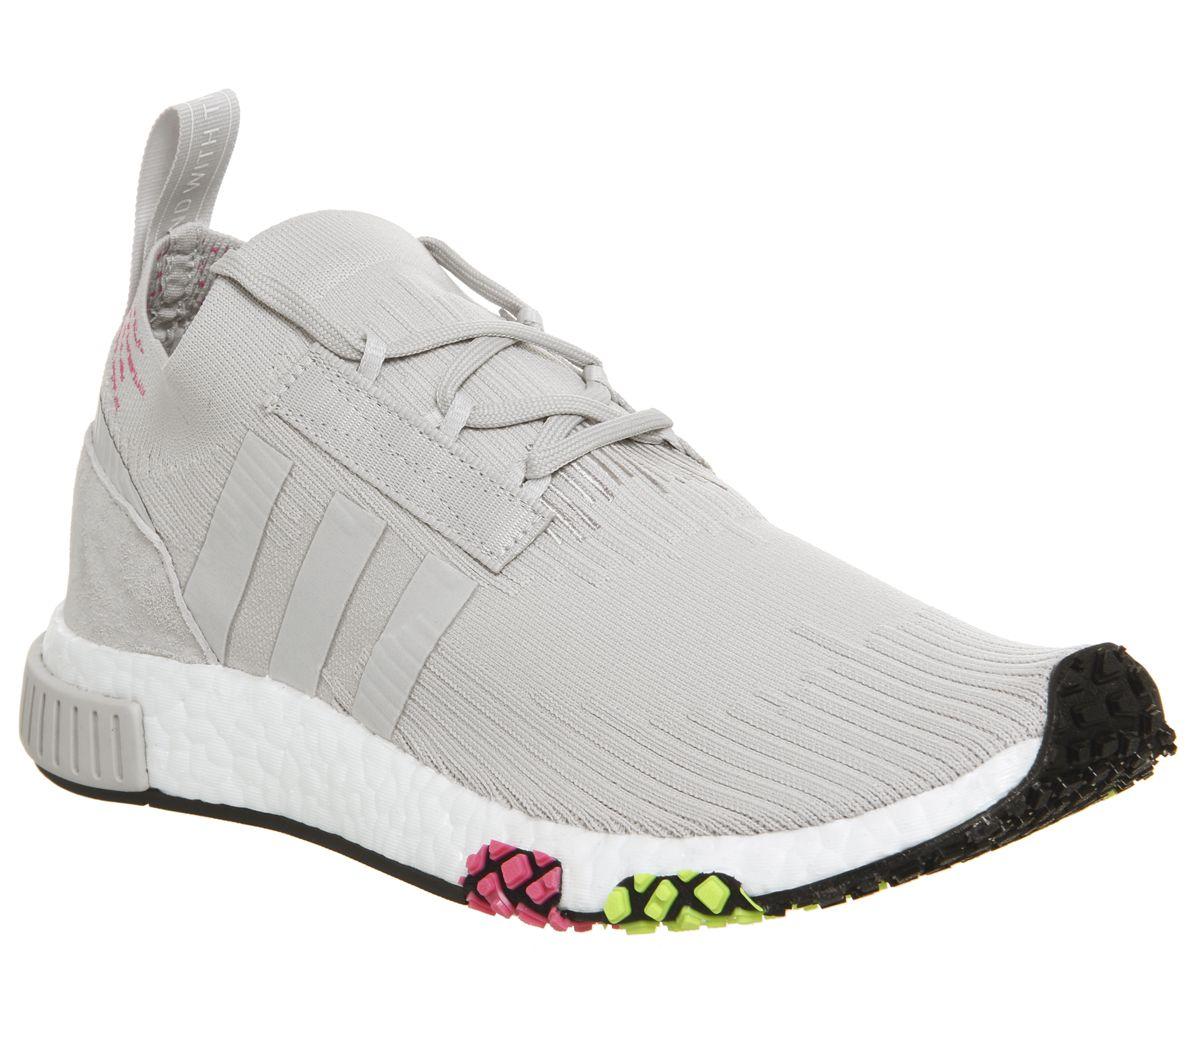 adidas nmd gris et rose